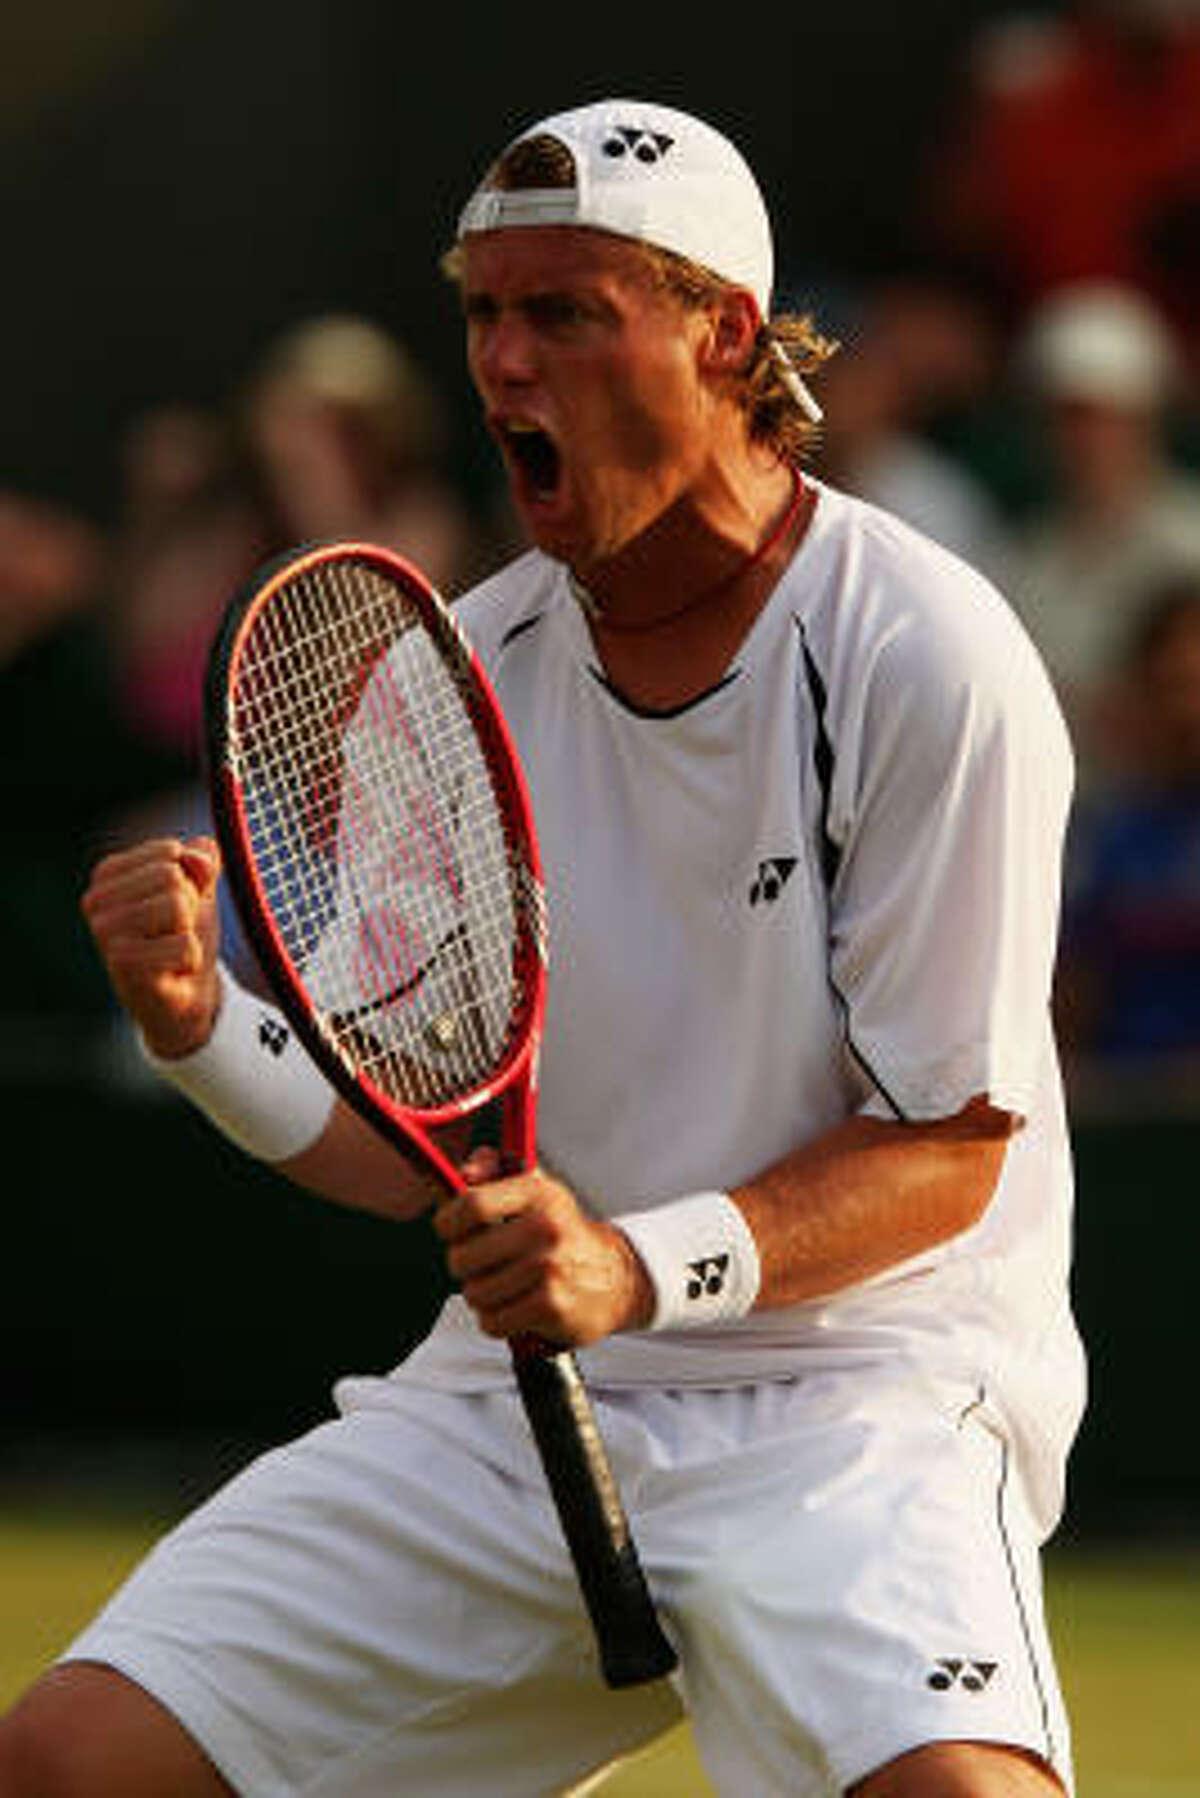 Australia's Lleyton Hewitt celebrates during his fourth-round victory over Radek Stepanek of Czech Republic. Hewitt beat 23rd-ranked Stepanek 4-6, 2-6, 6-1, 6-2, 6-2.